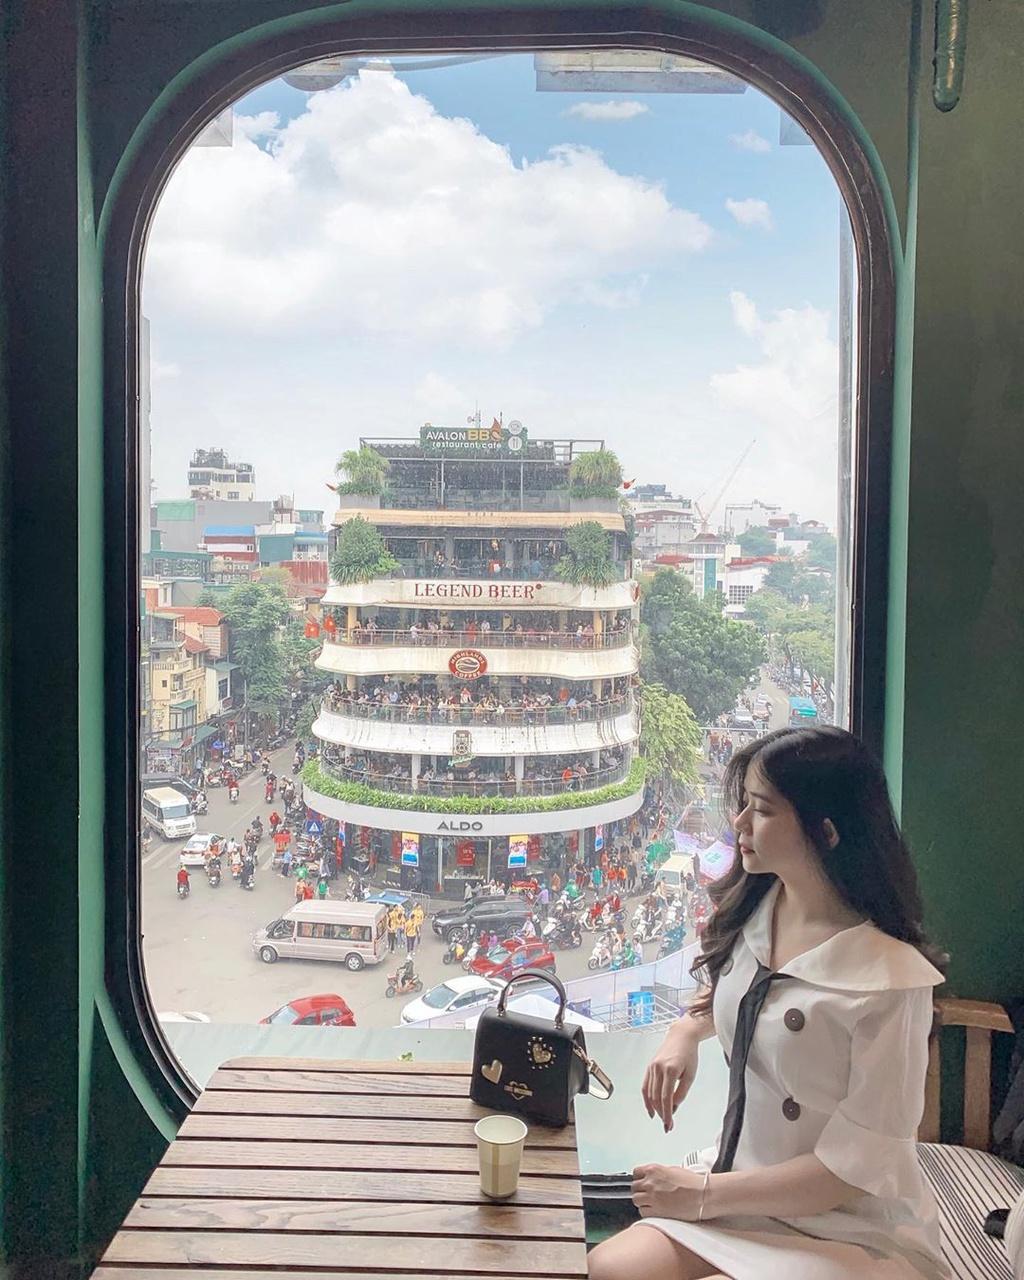 Chi hang trieu dong dat cho xem phao hoa o Ho Guom hinh anh 9 9.jpg